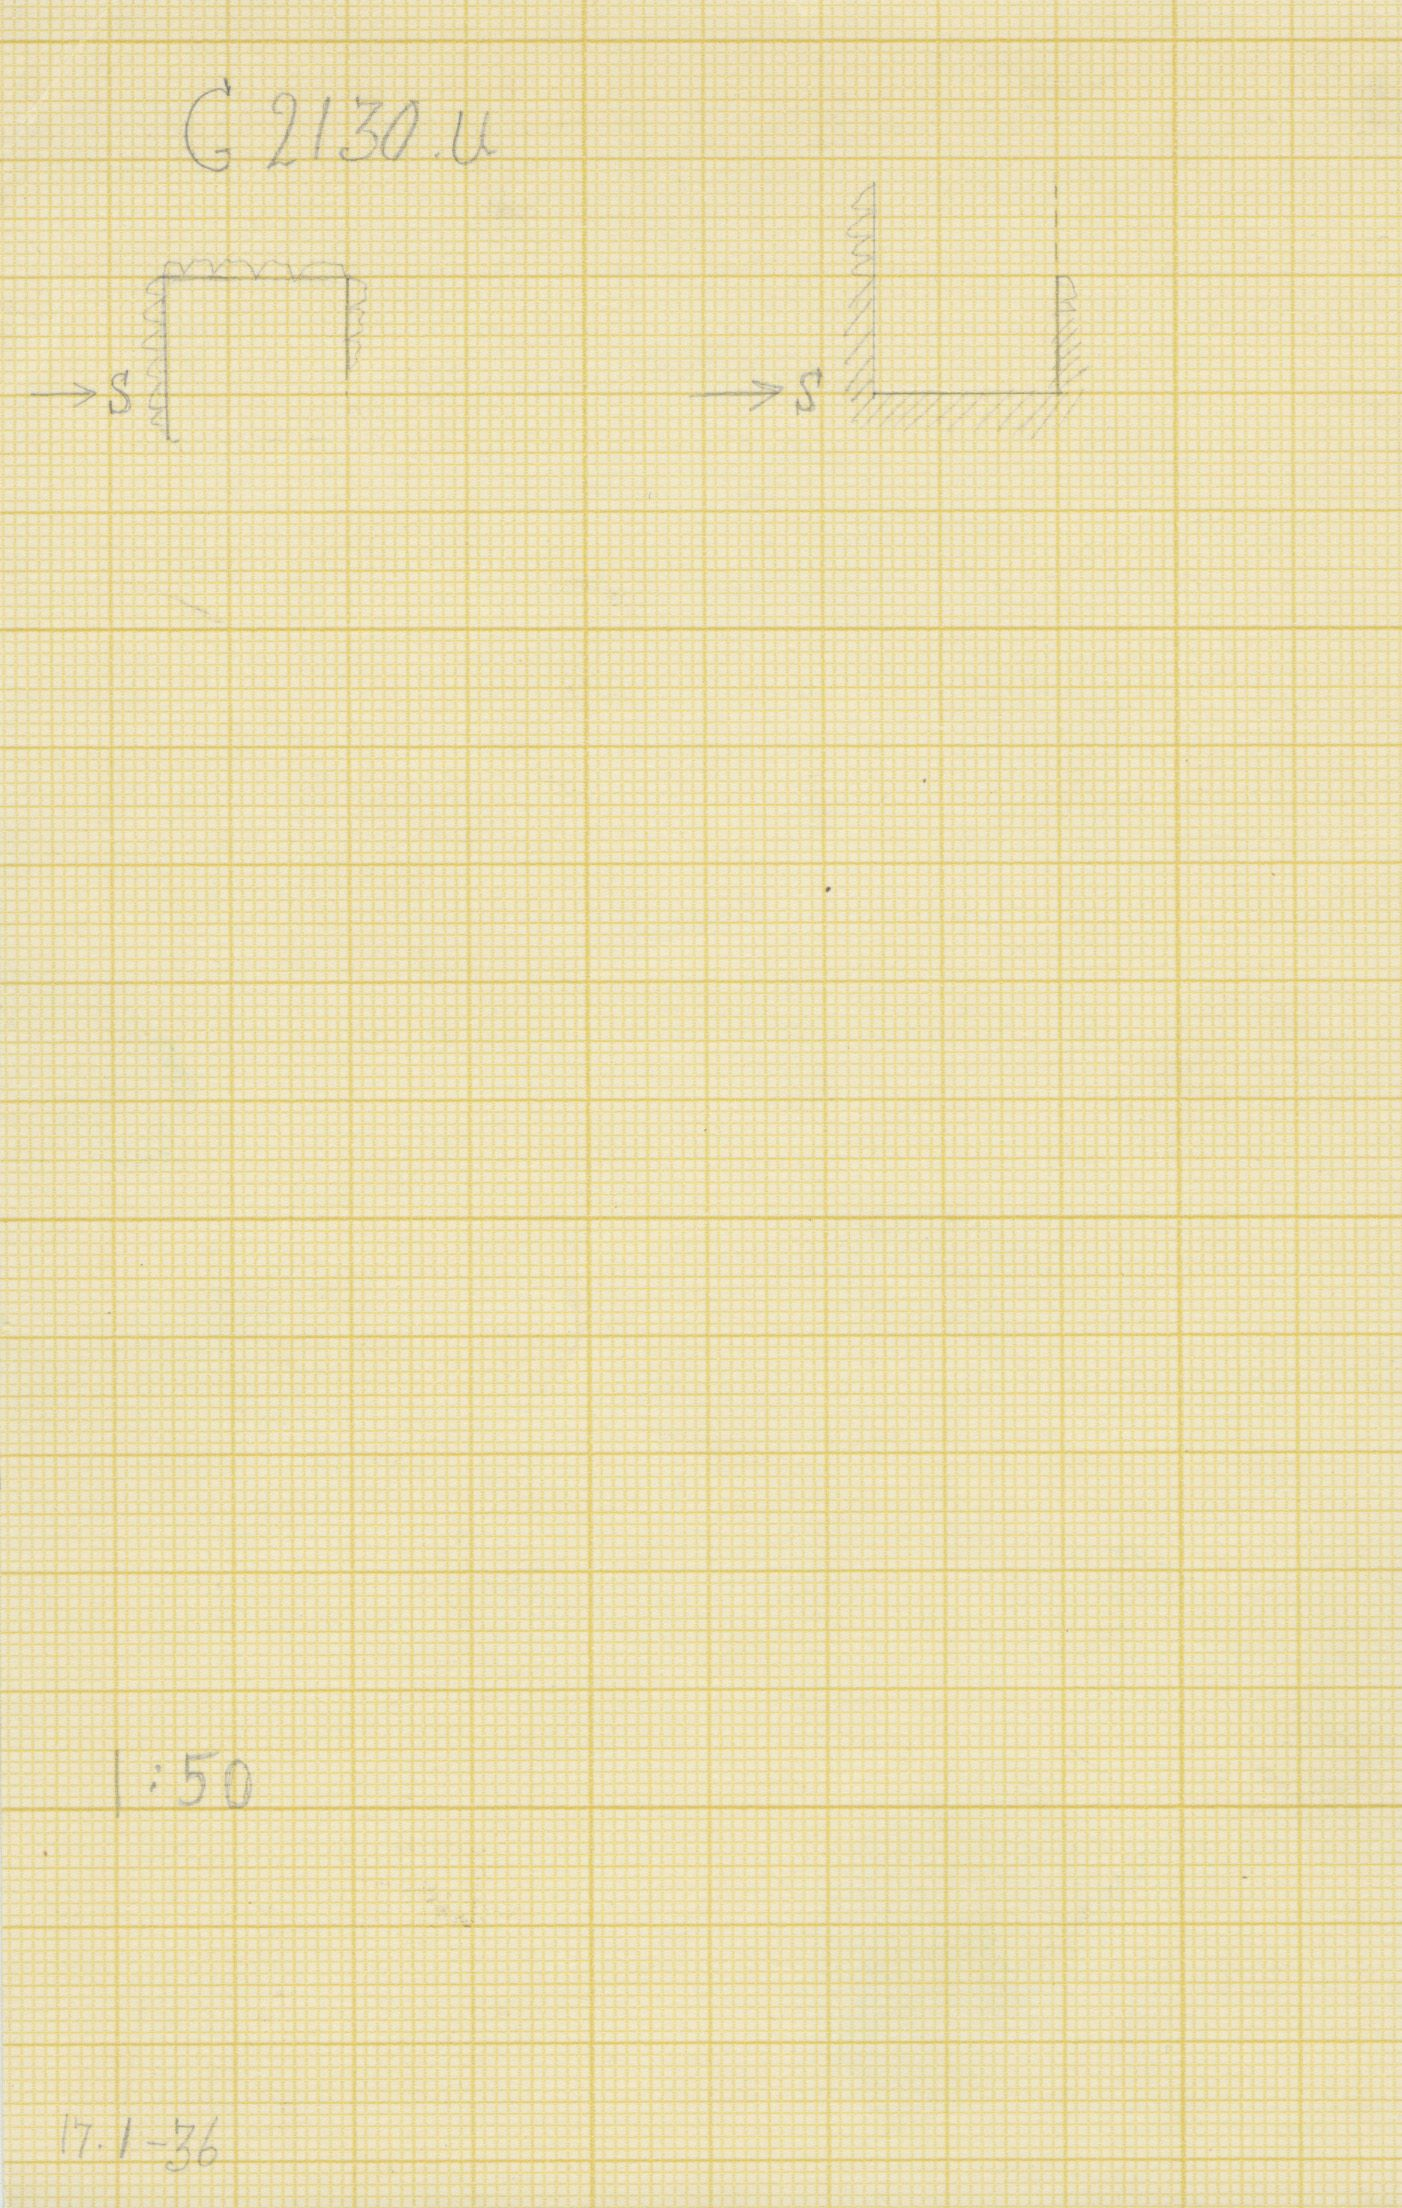 Maps and plans: G 2130, Shaft U